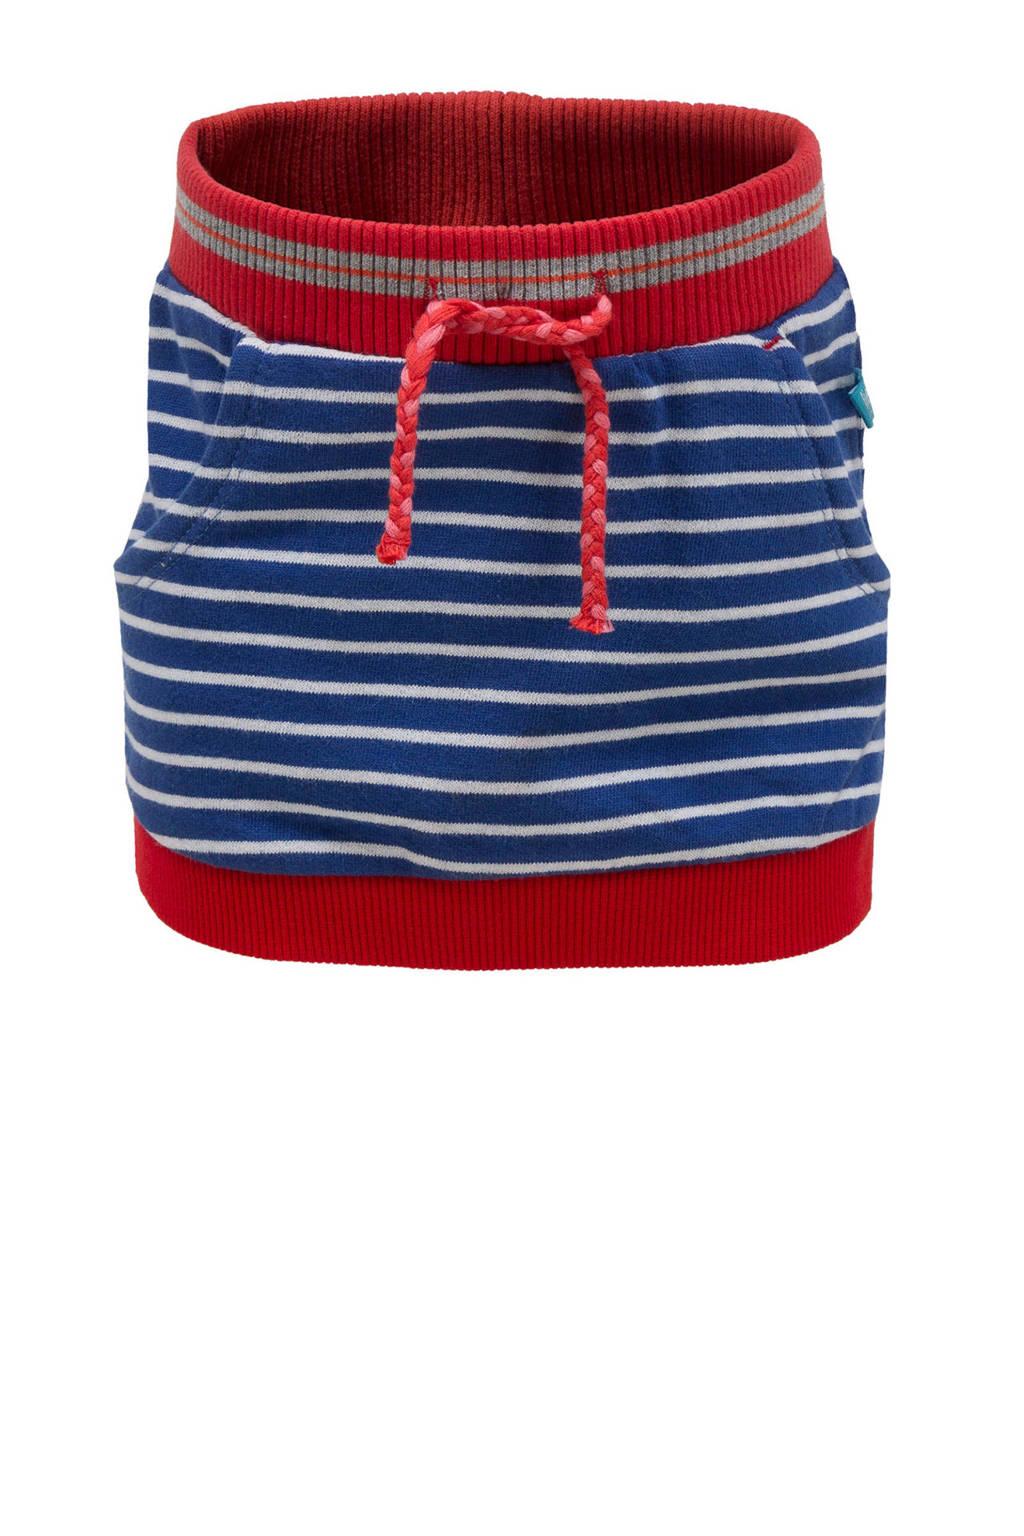 lief! sweatrok met streep dessin blauw/rood, Blauw/rood